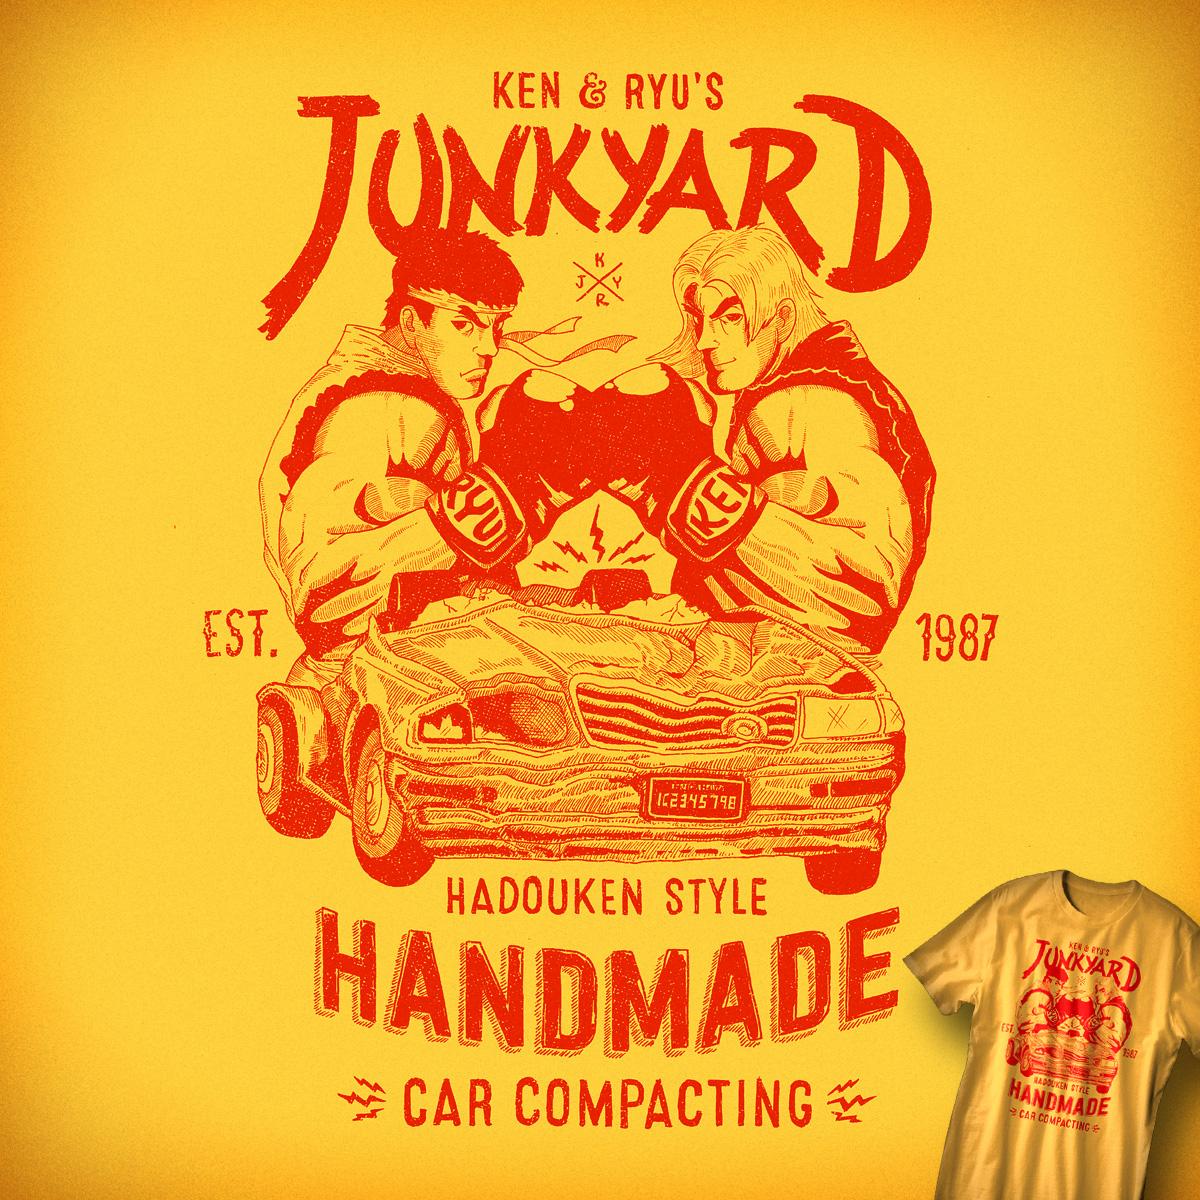 Ken & Ryu's Junkyard by Santo76 on Threadless